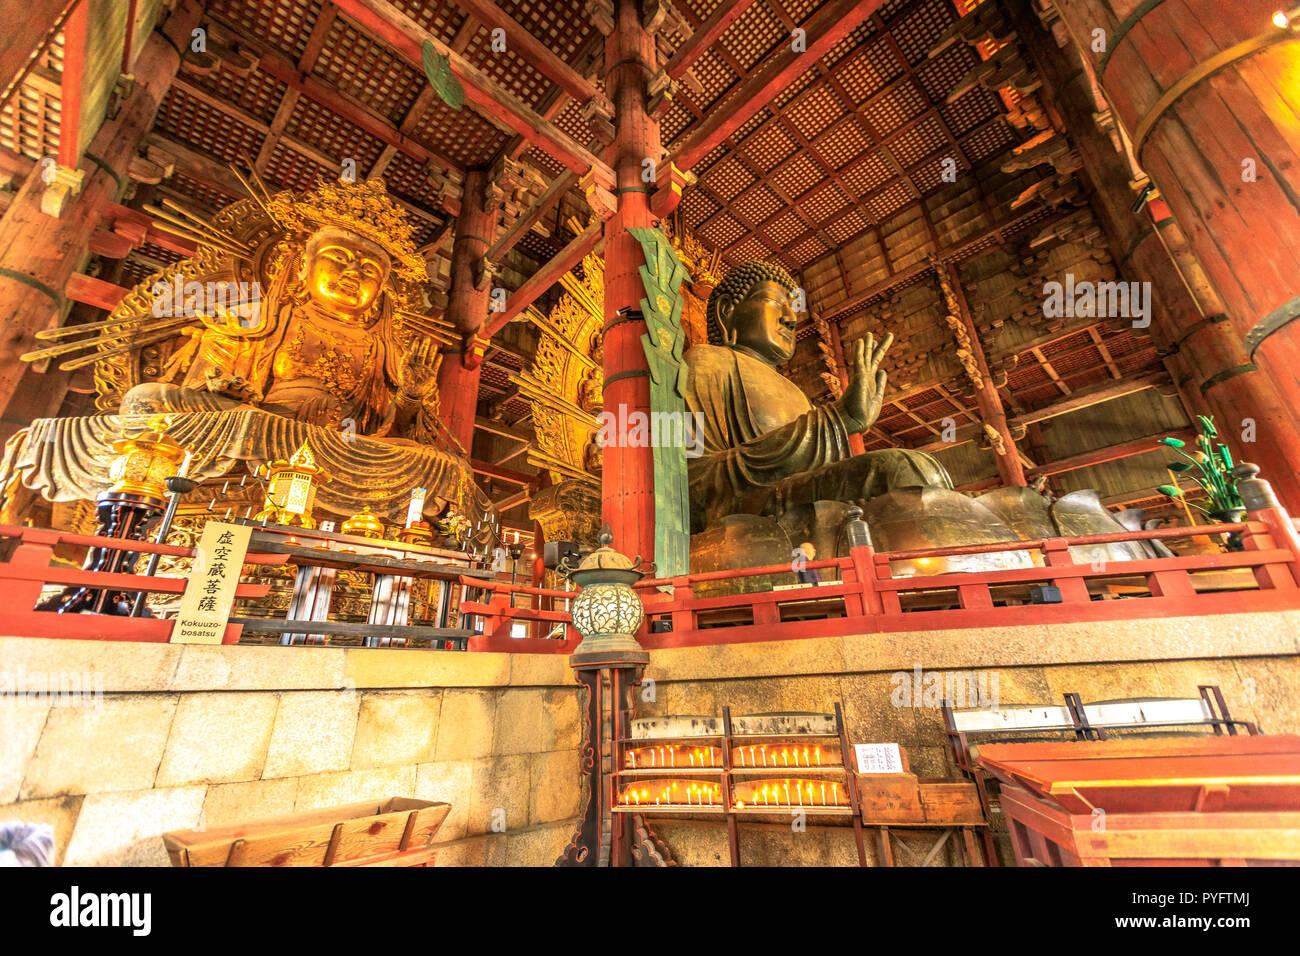 Nara, Japan - April 26, 2017: the Great Buddha or Daibutsu, the world's largest bronze statue of Buddha Vairocana, in the Great Buddha Hall of Todai-ji a Buddhist temple in Nara. UNESCO Heritage Site. - Stock Image